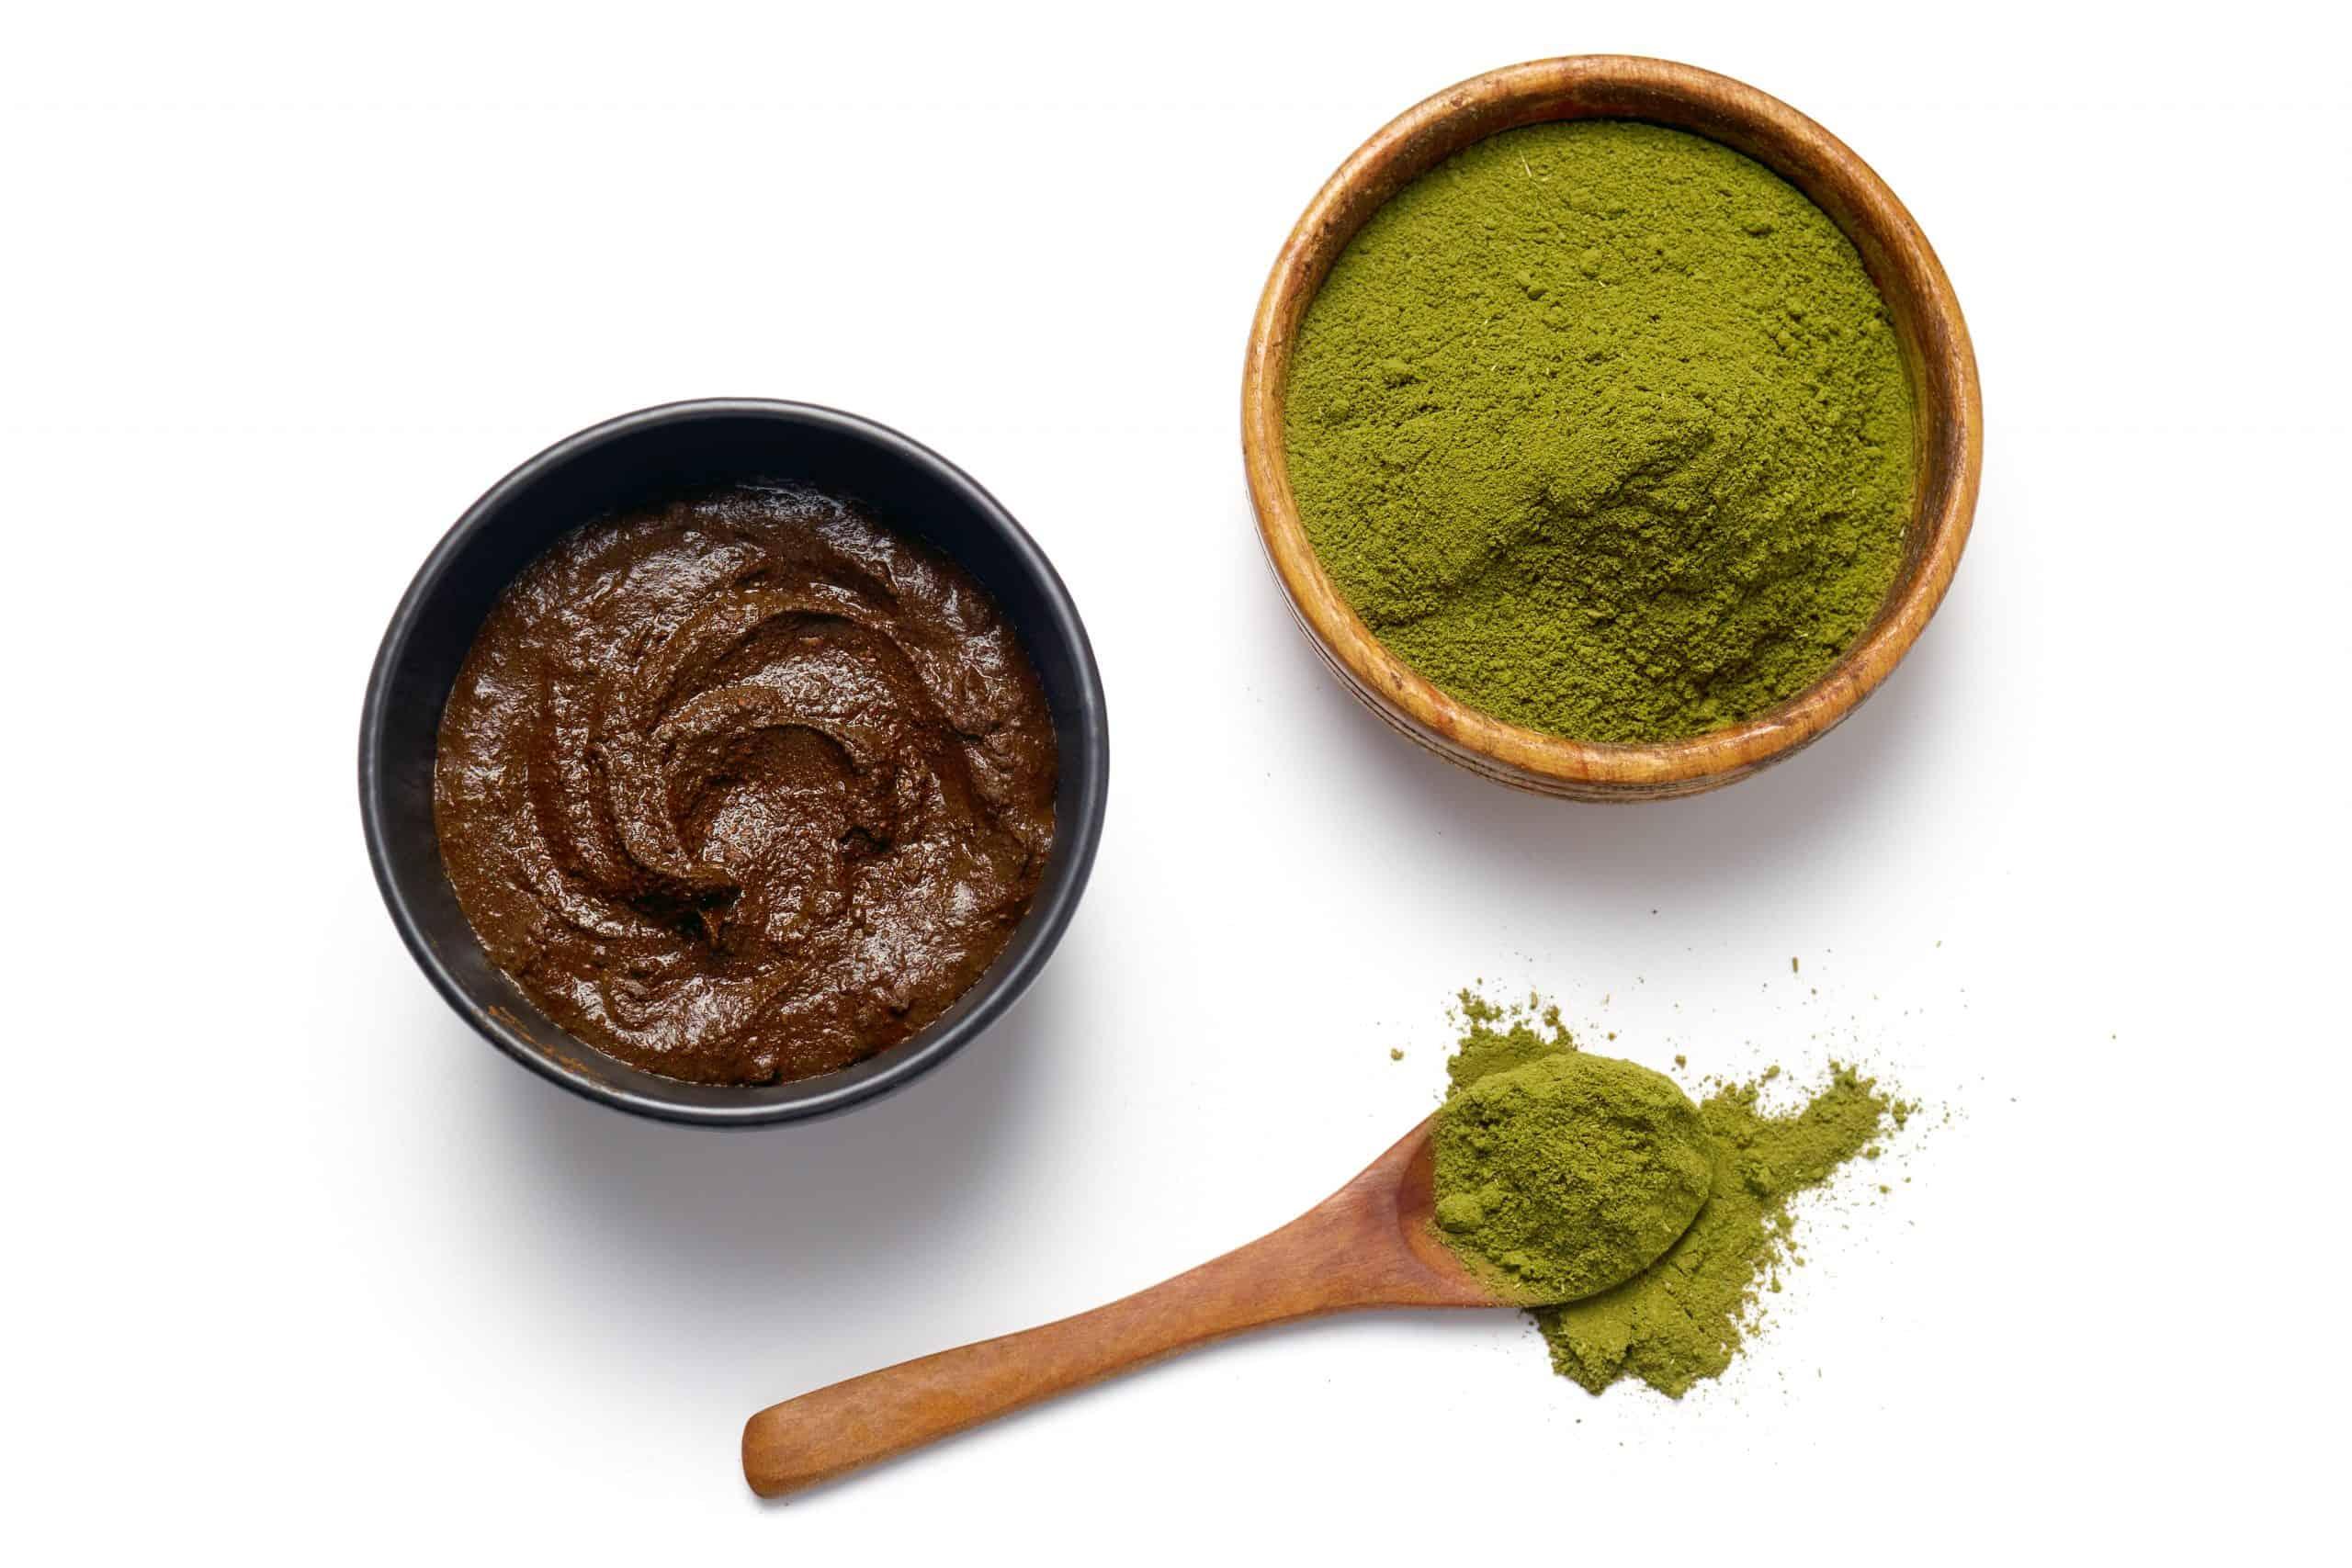 Herbal Henna powder and henna paste